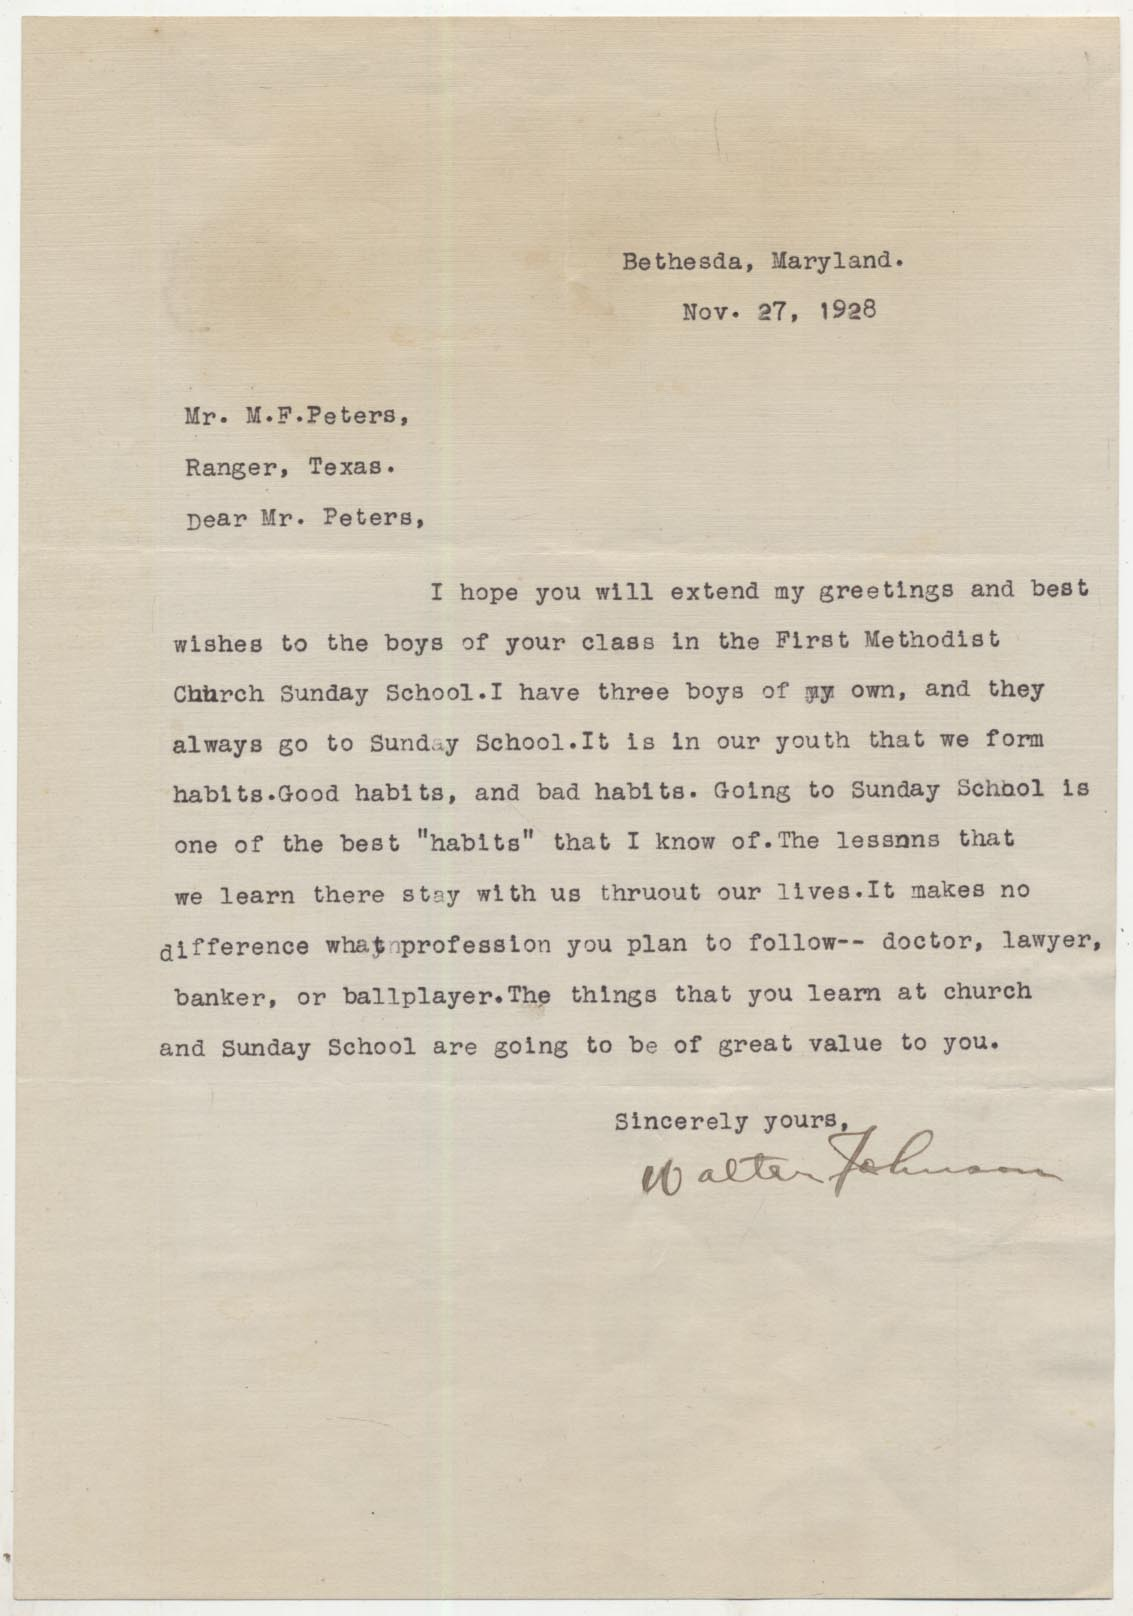 Lot #8  Letter  Johnson, Walter (1928) Cond: 9